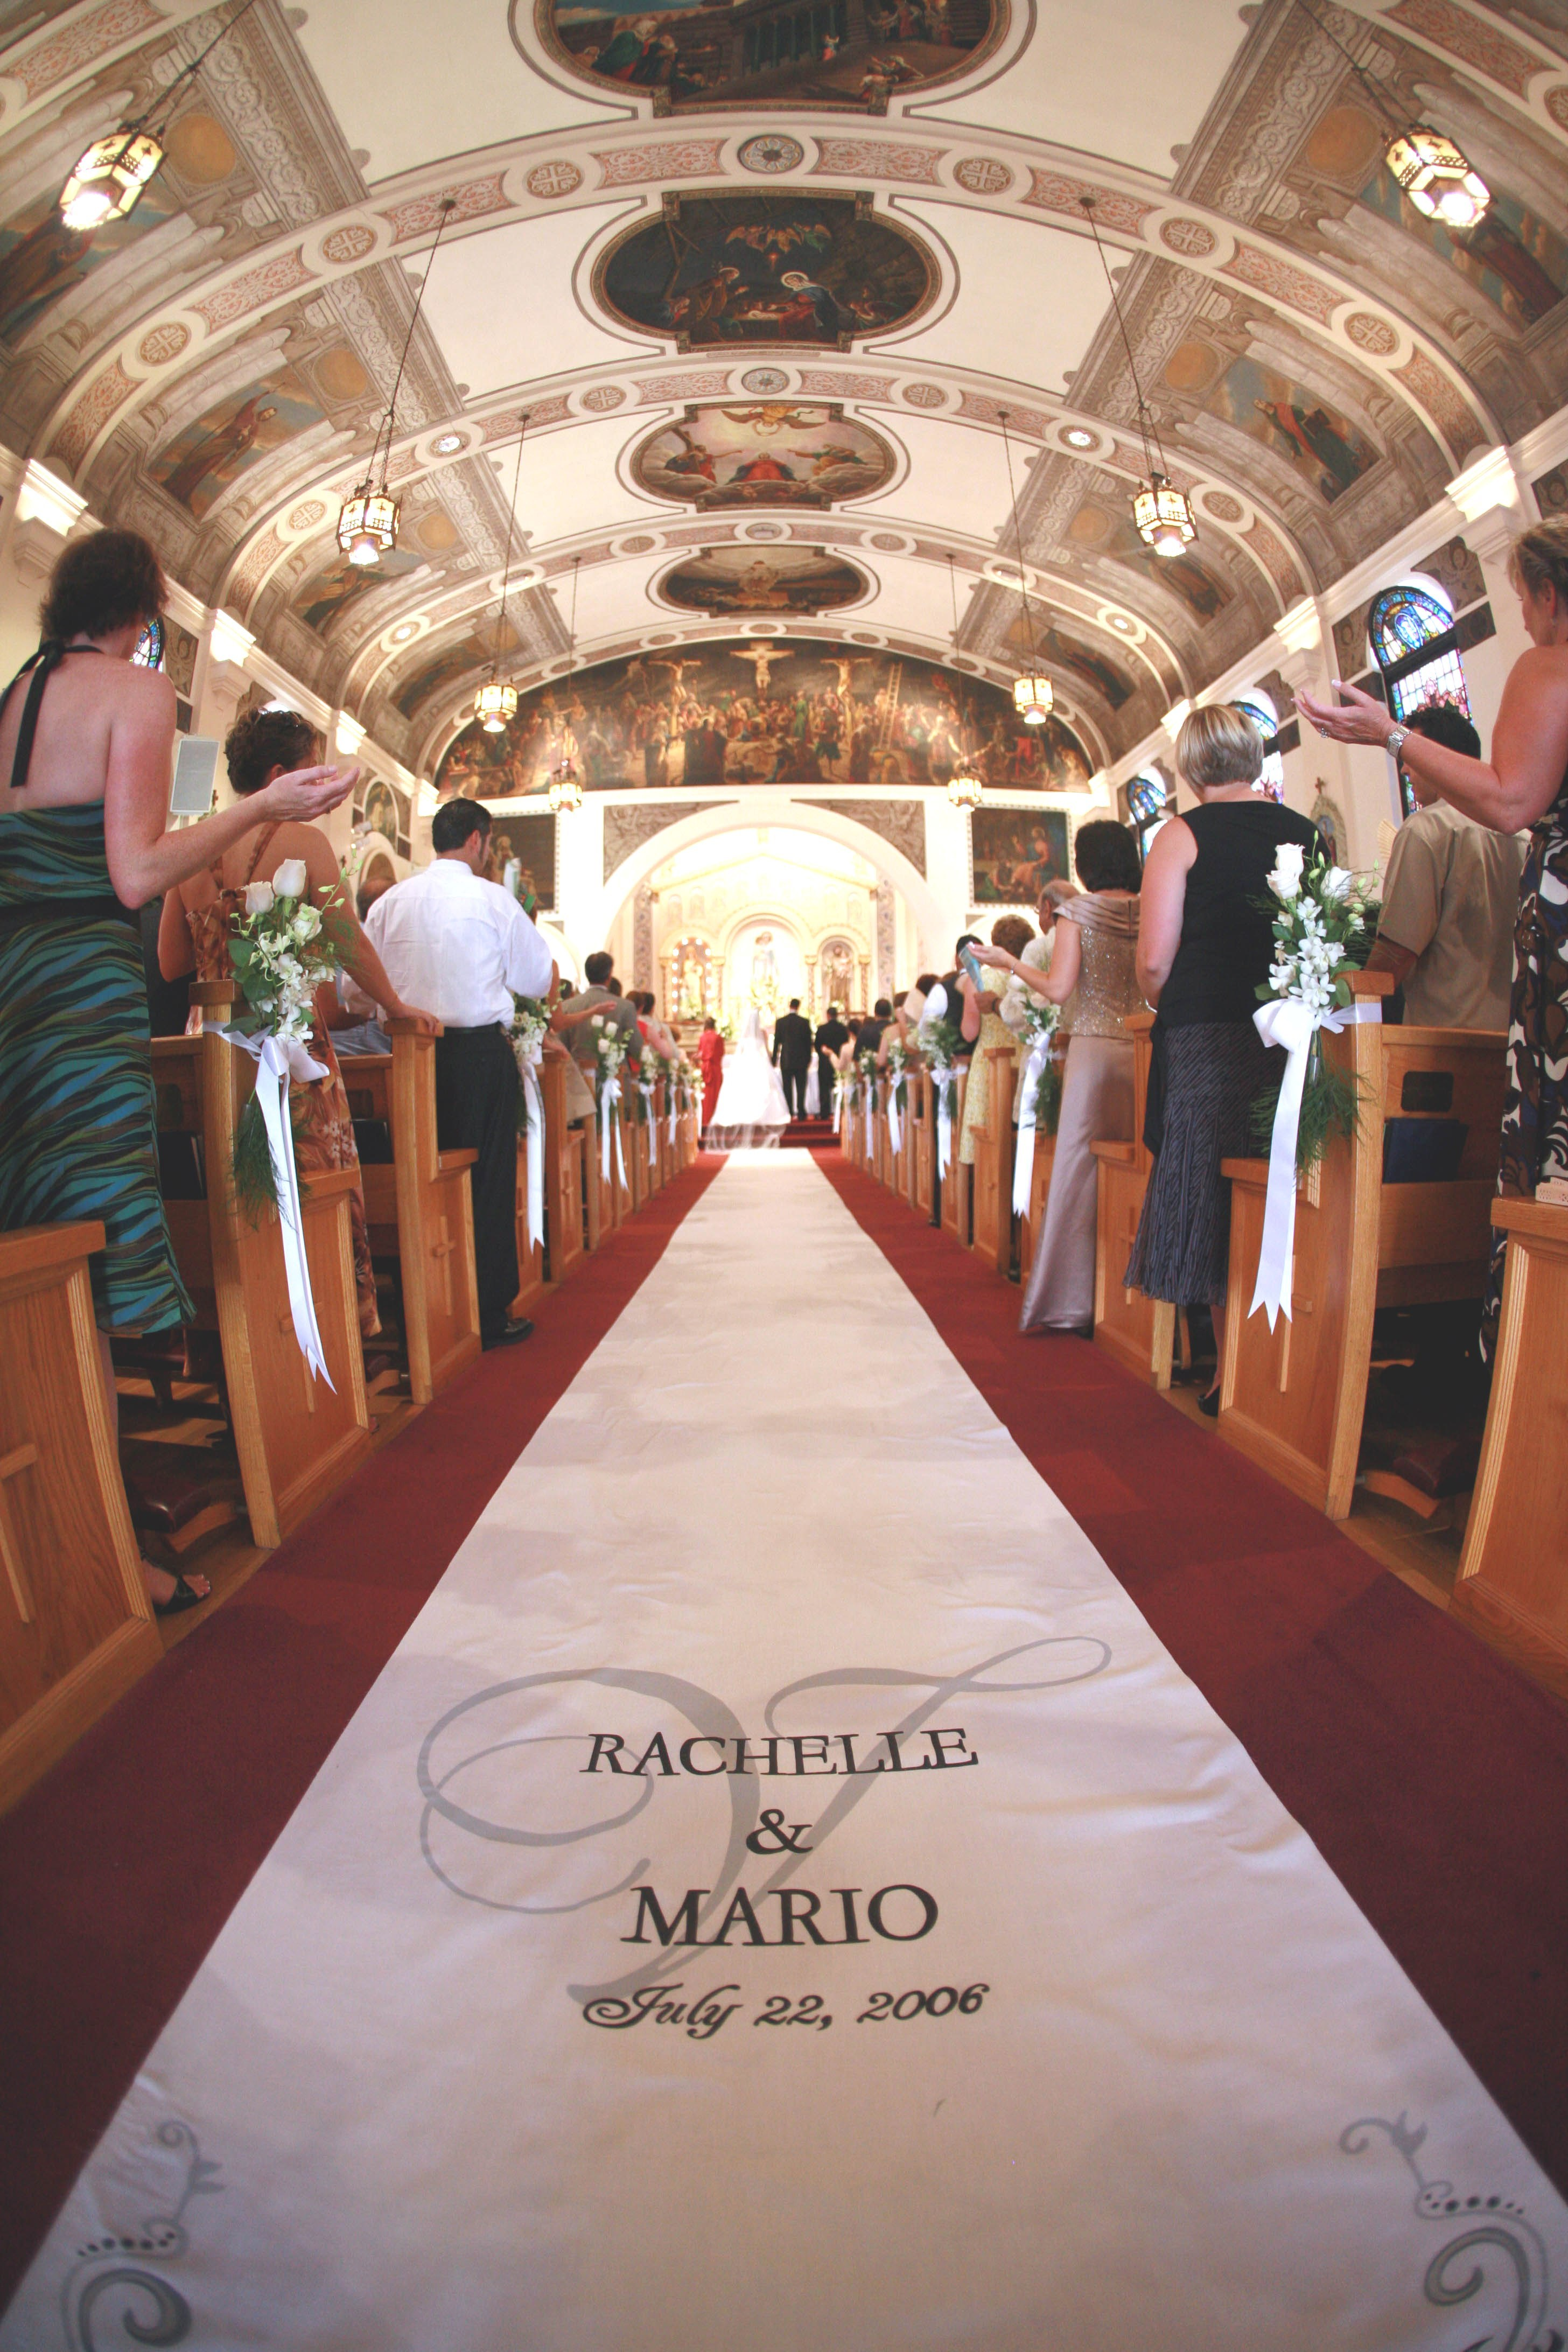 Ceremony, Flowers & Decor, Decor, Stationery, invitation, Classic, Classic Wedding Invitations, Invitations, Monogram, Aisle, Design, Elegance, Runner, Brocade